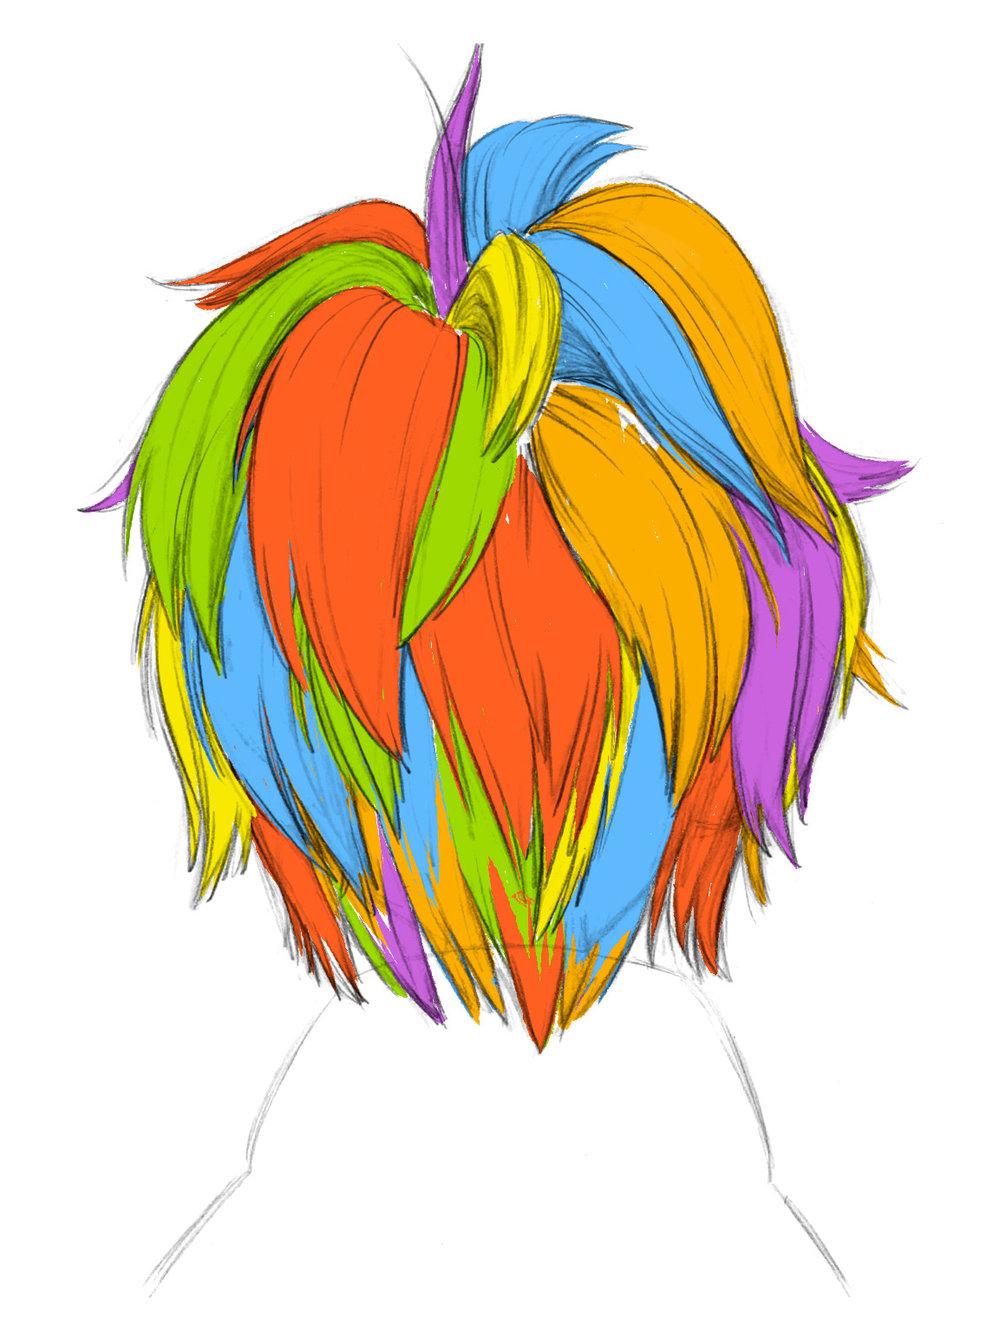 Hiro's Hair: Chunks